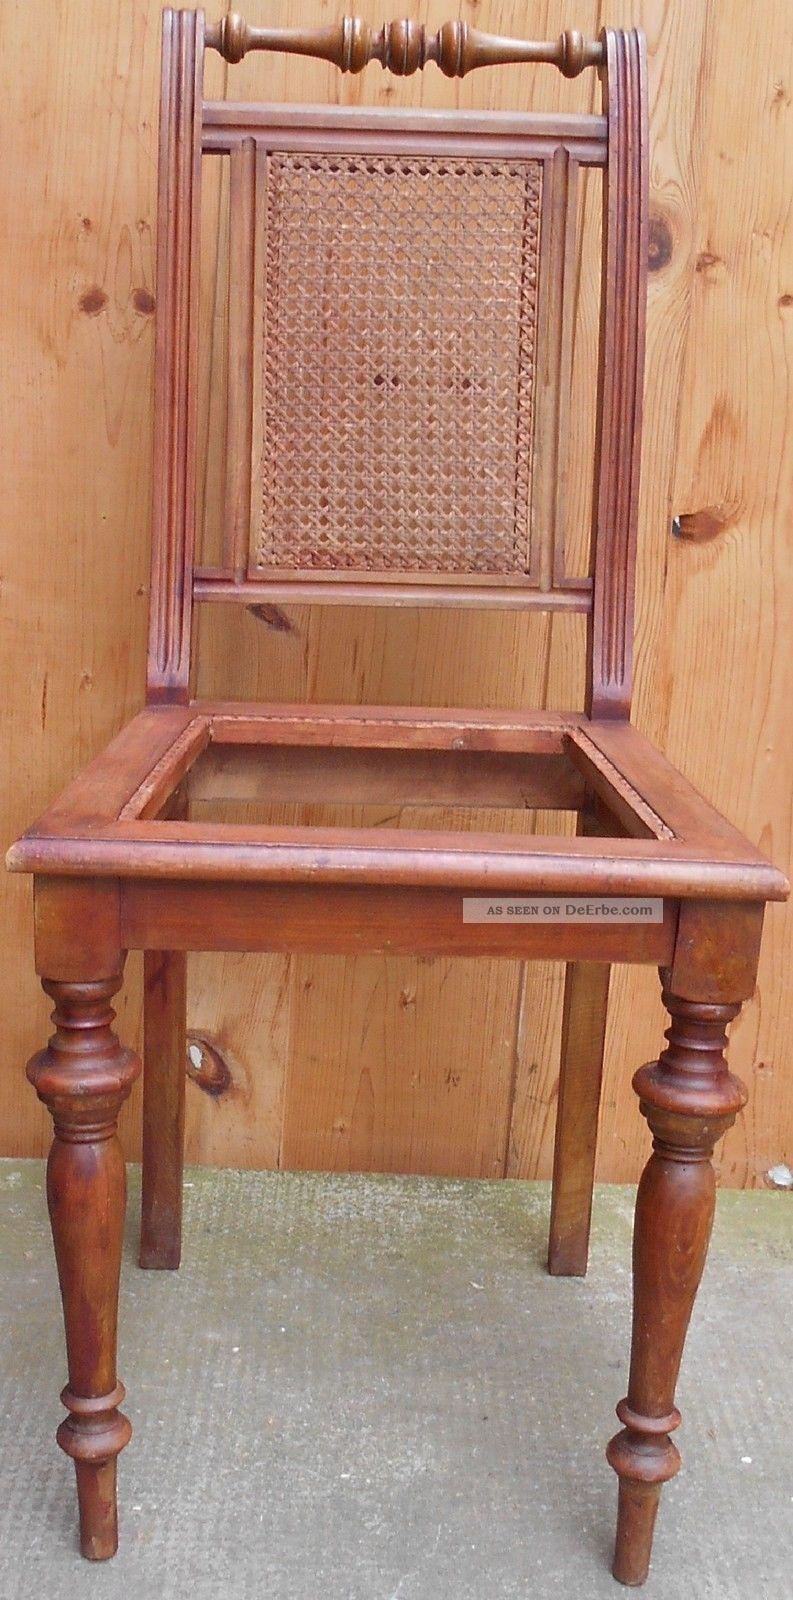 Walzenstuhl Grunderzeit Holz Stuhl Ohne Sitz Geflecht